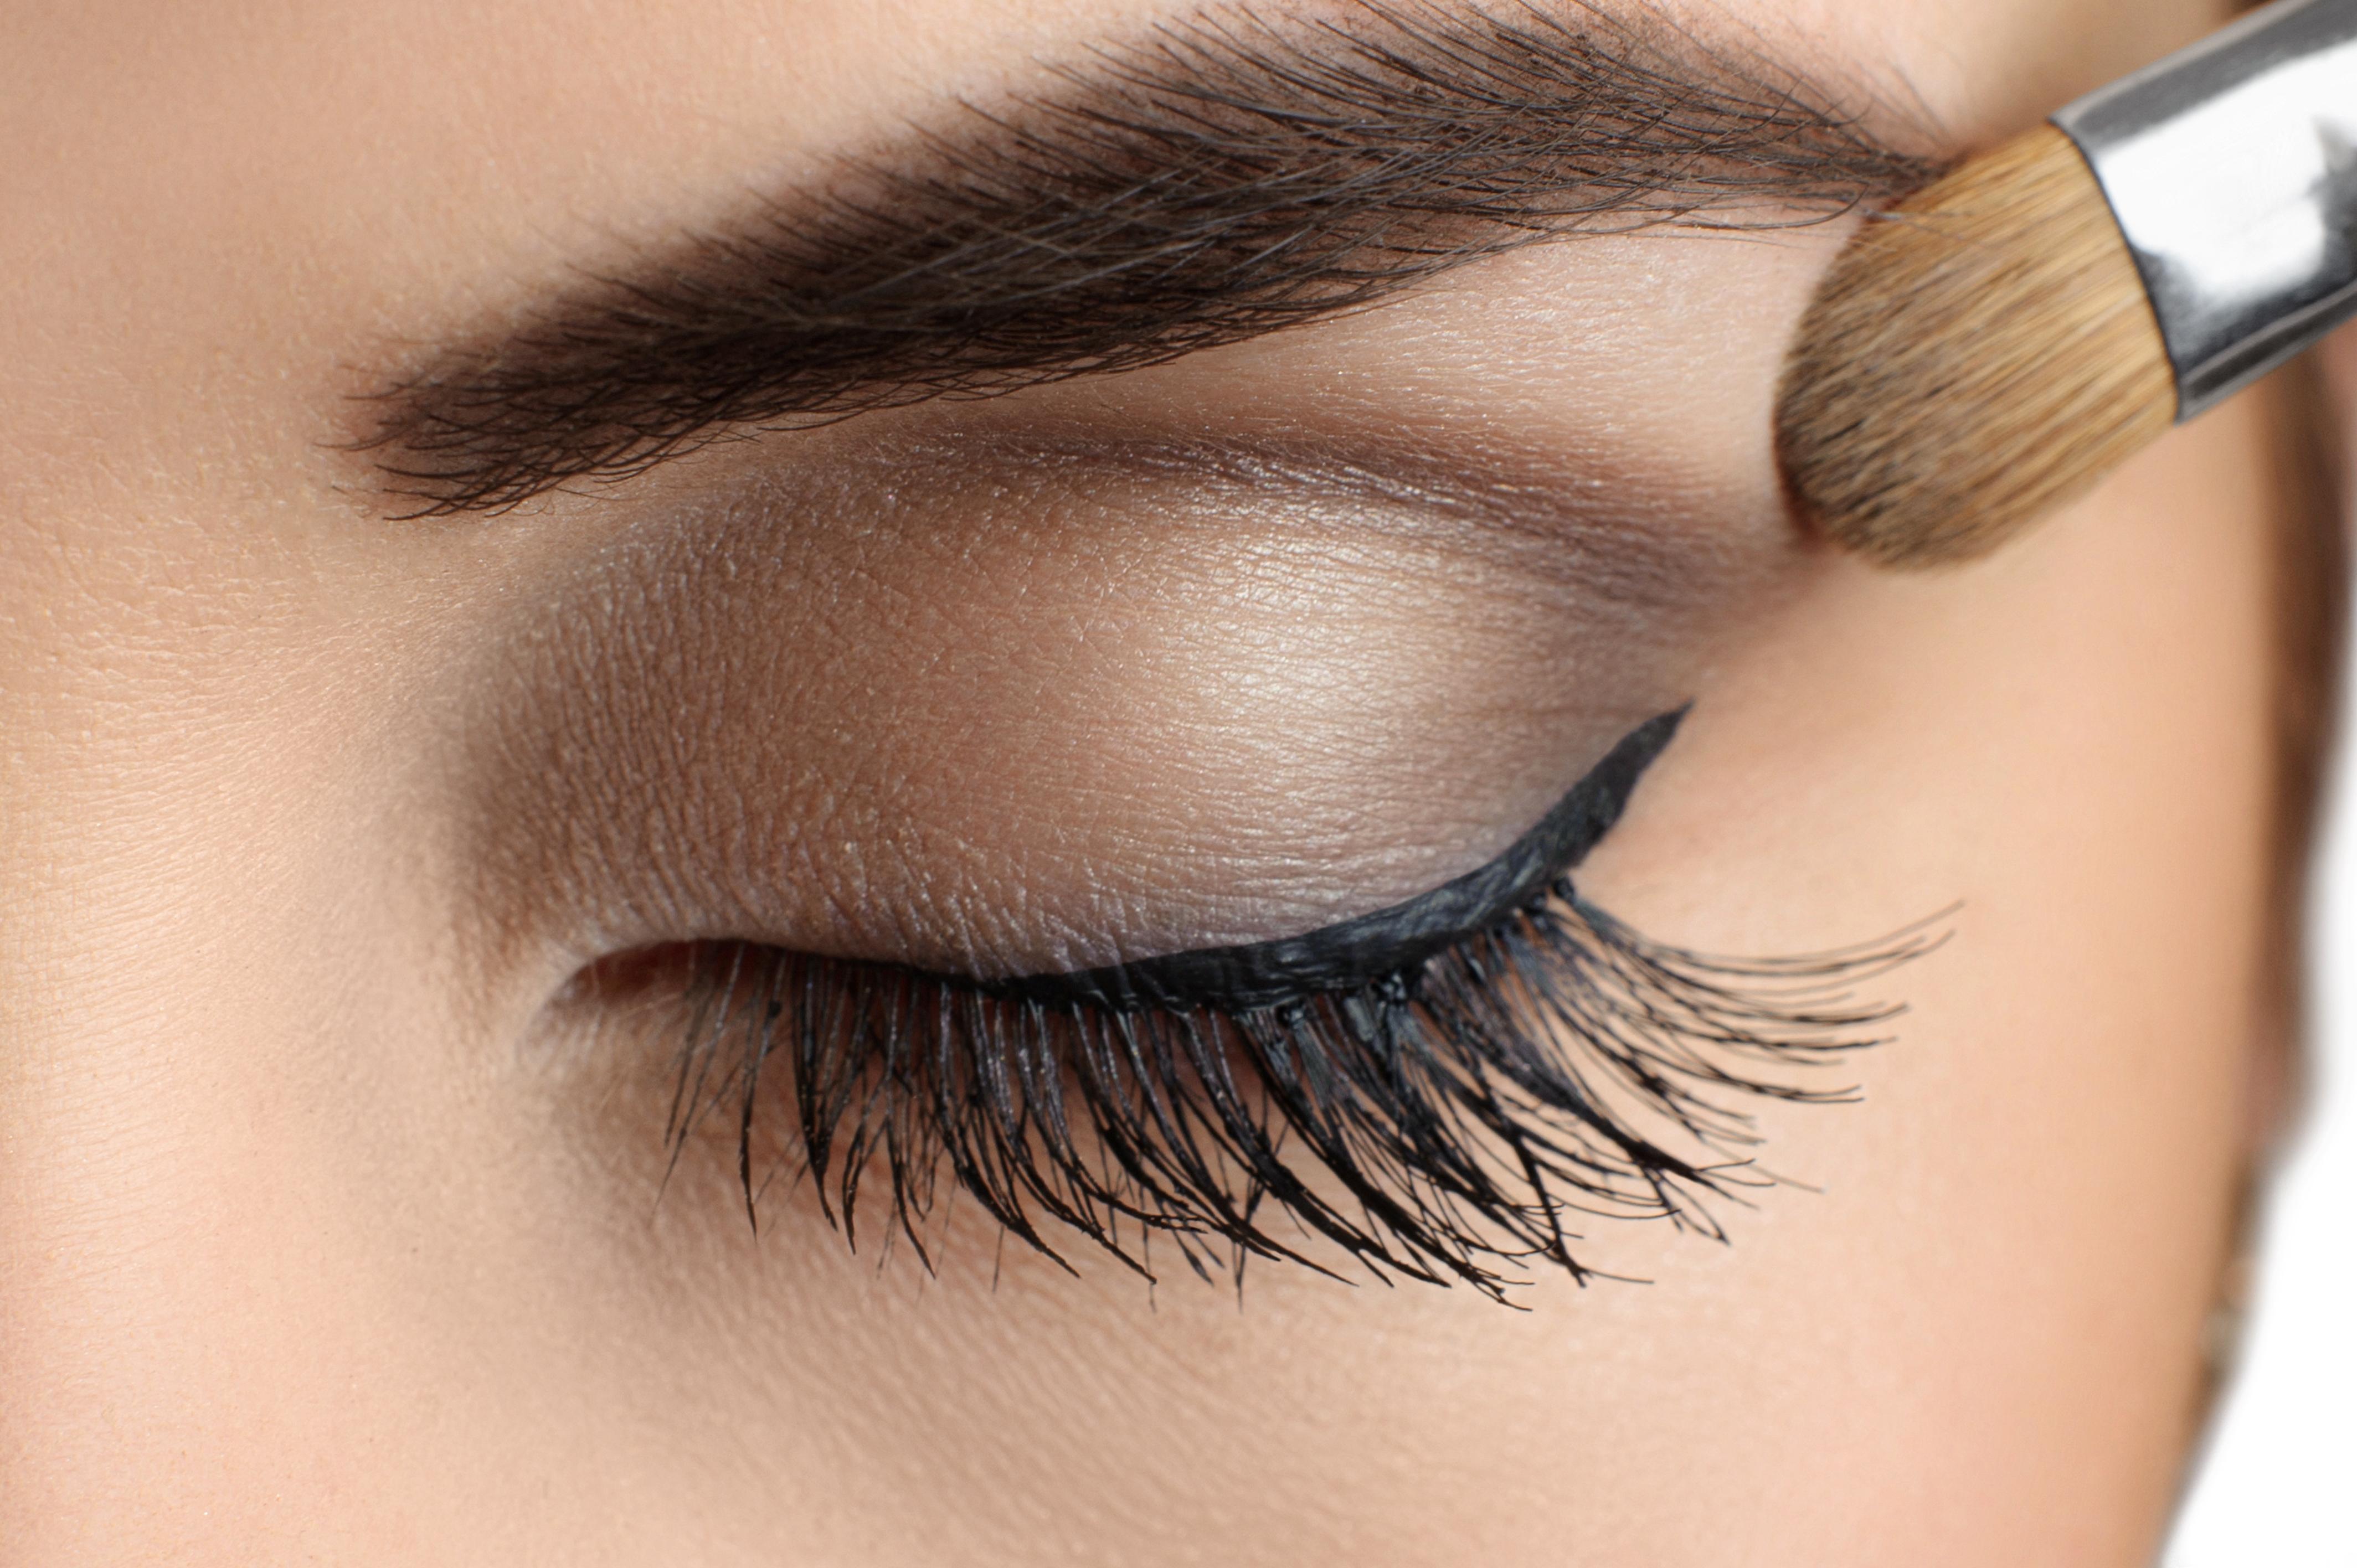 5 Makeup Looks To Make Brown Eyes Pop